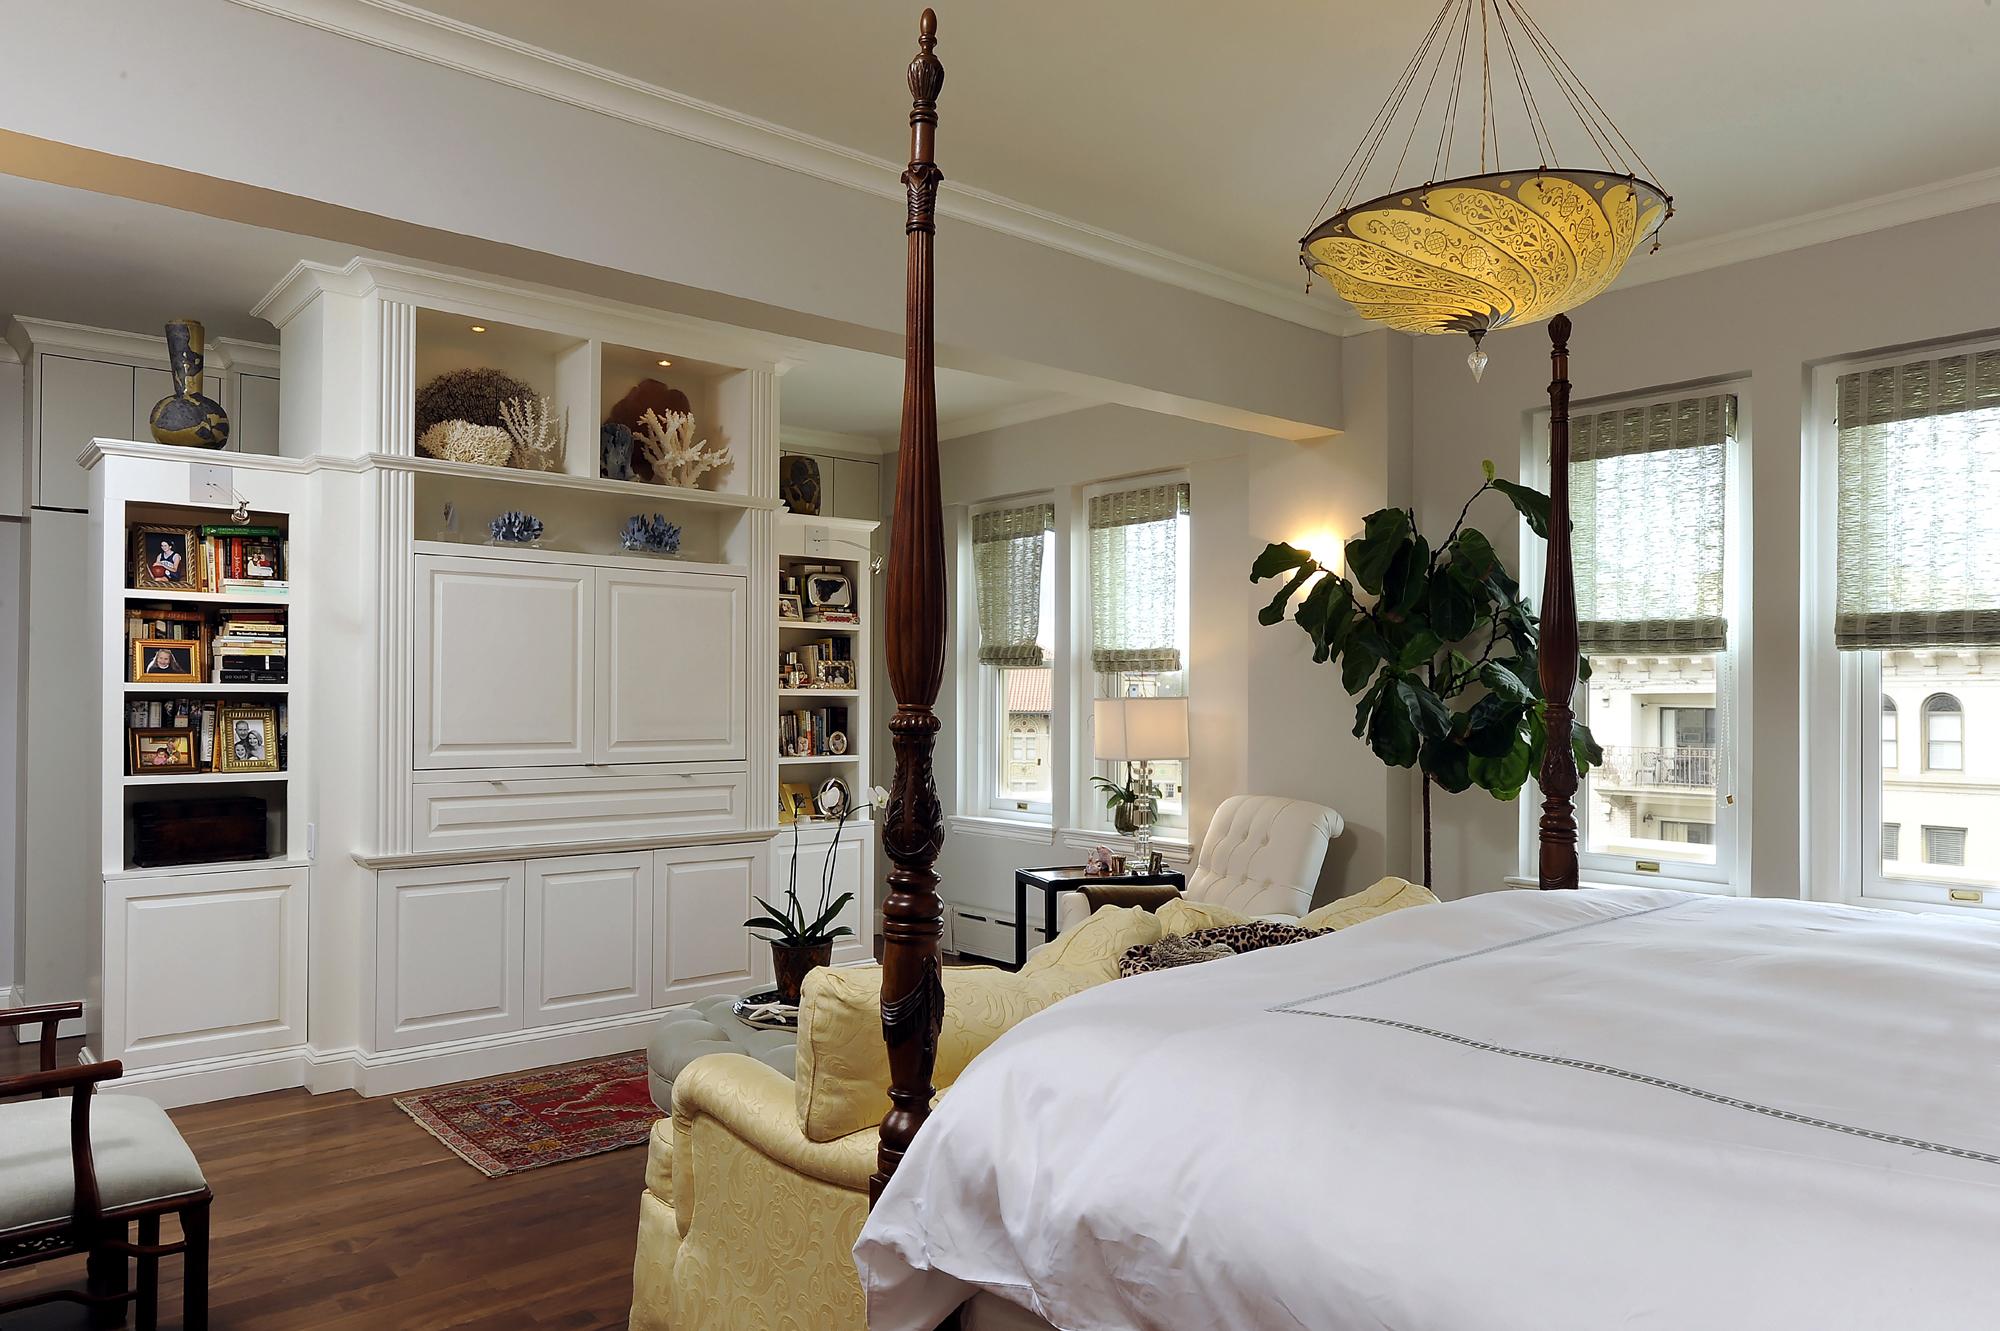 Master Suites & Bedrooms Photos Gallery